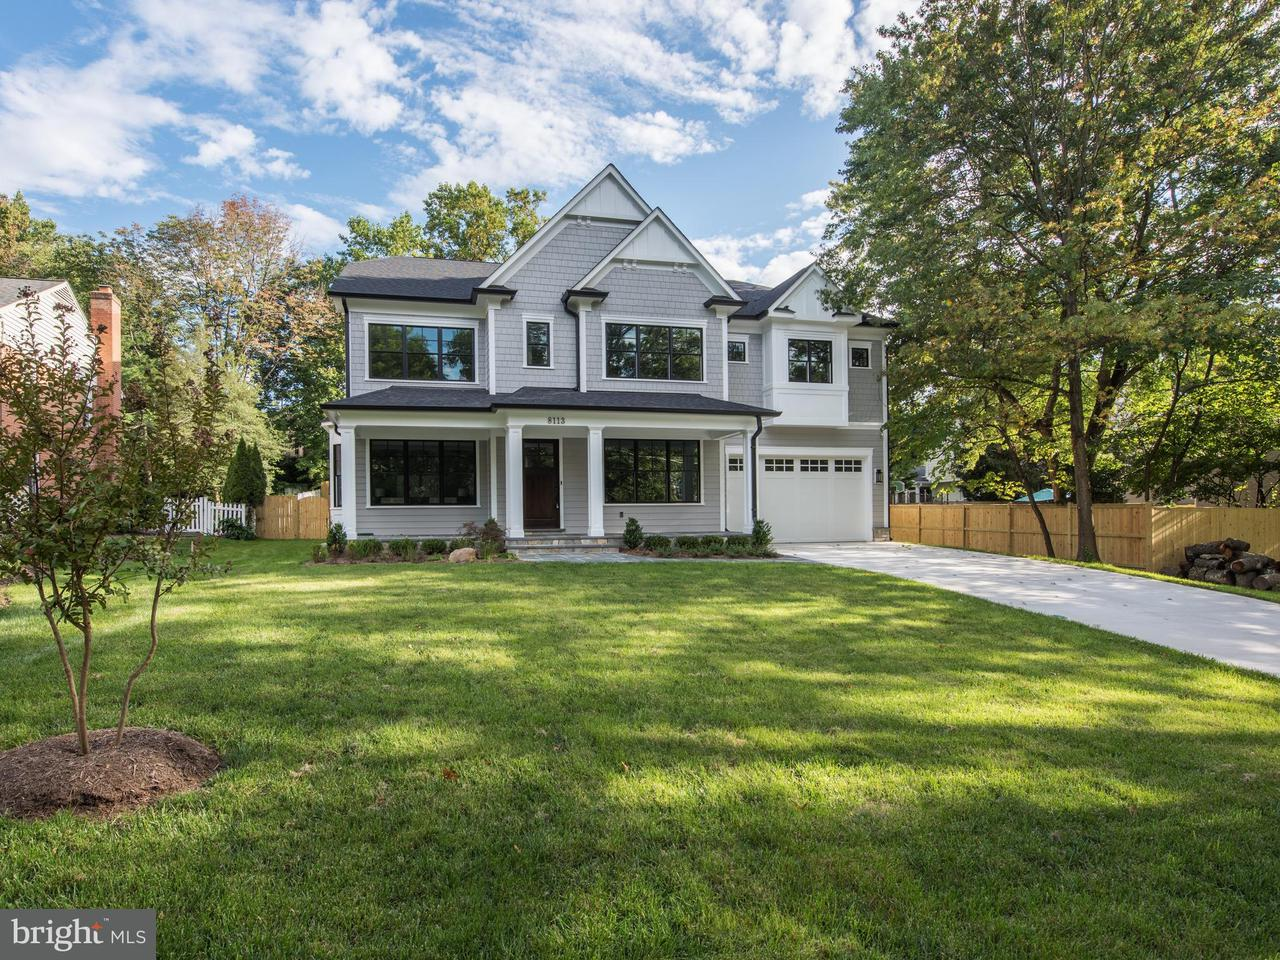 Single Family Home for Sale at 8113 THOREAU Drive 8113 THOREAU Drive Bethesda, Maryland 20817 United States